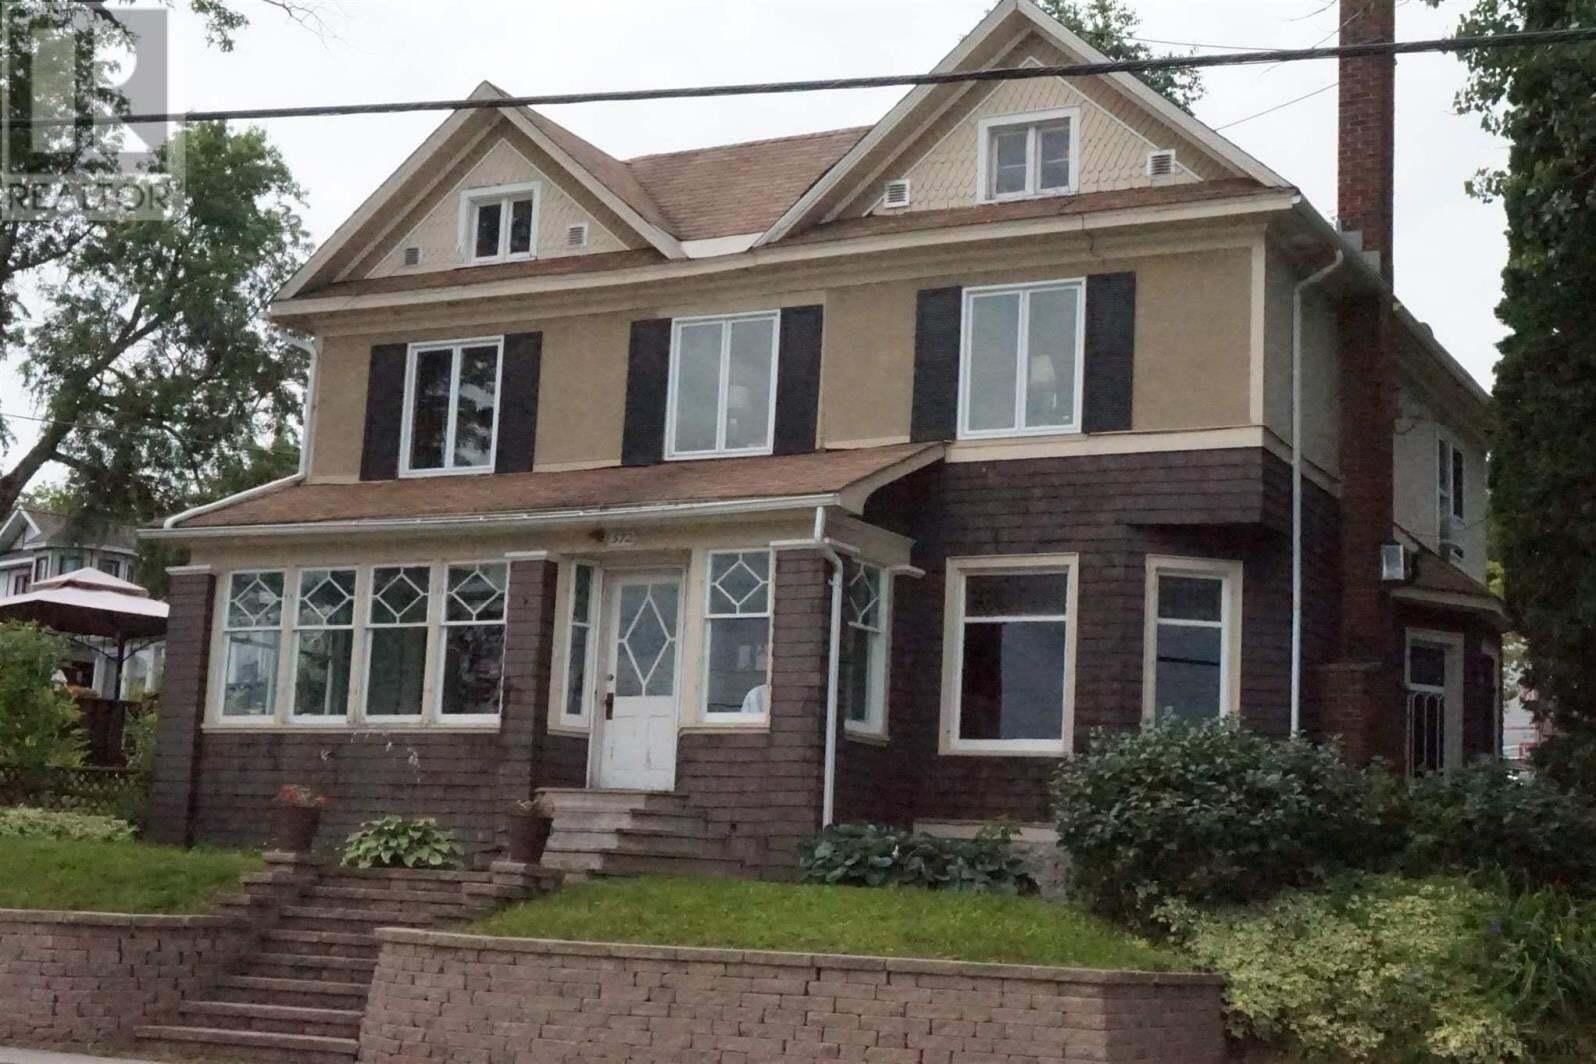 House for sale at 572 Lakeshore Rd S Temiskaming Shores Ontario - MLS: TM201590